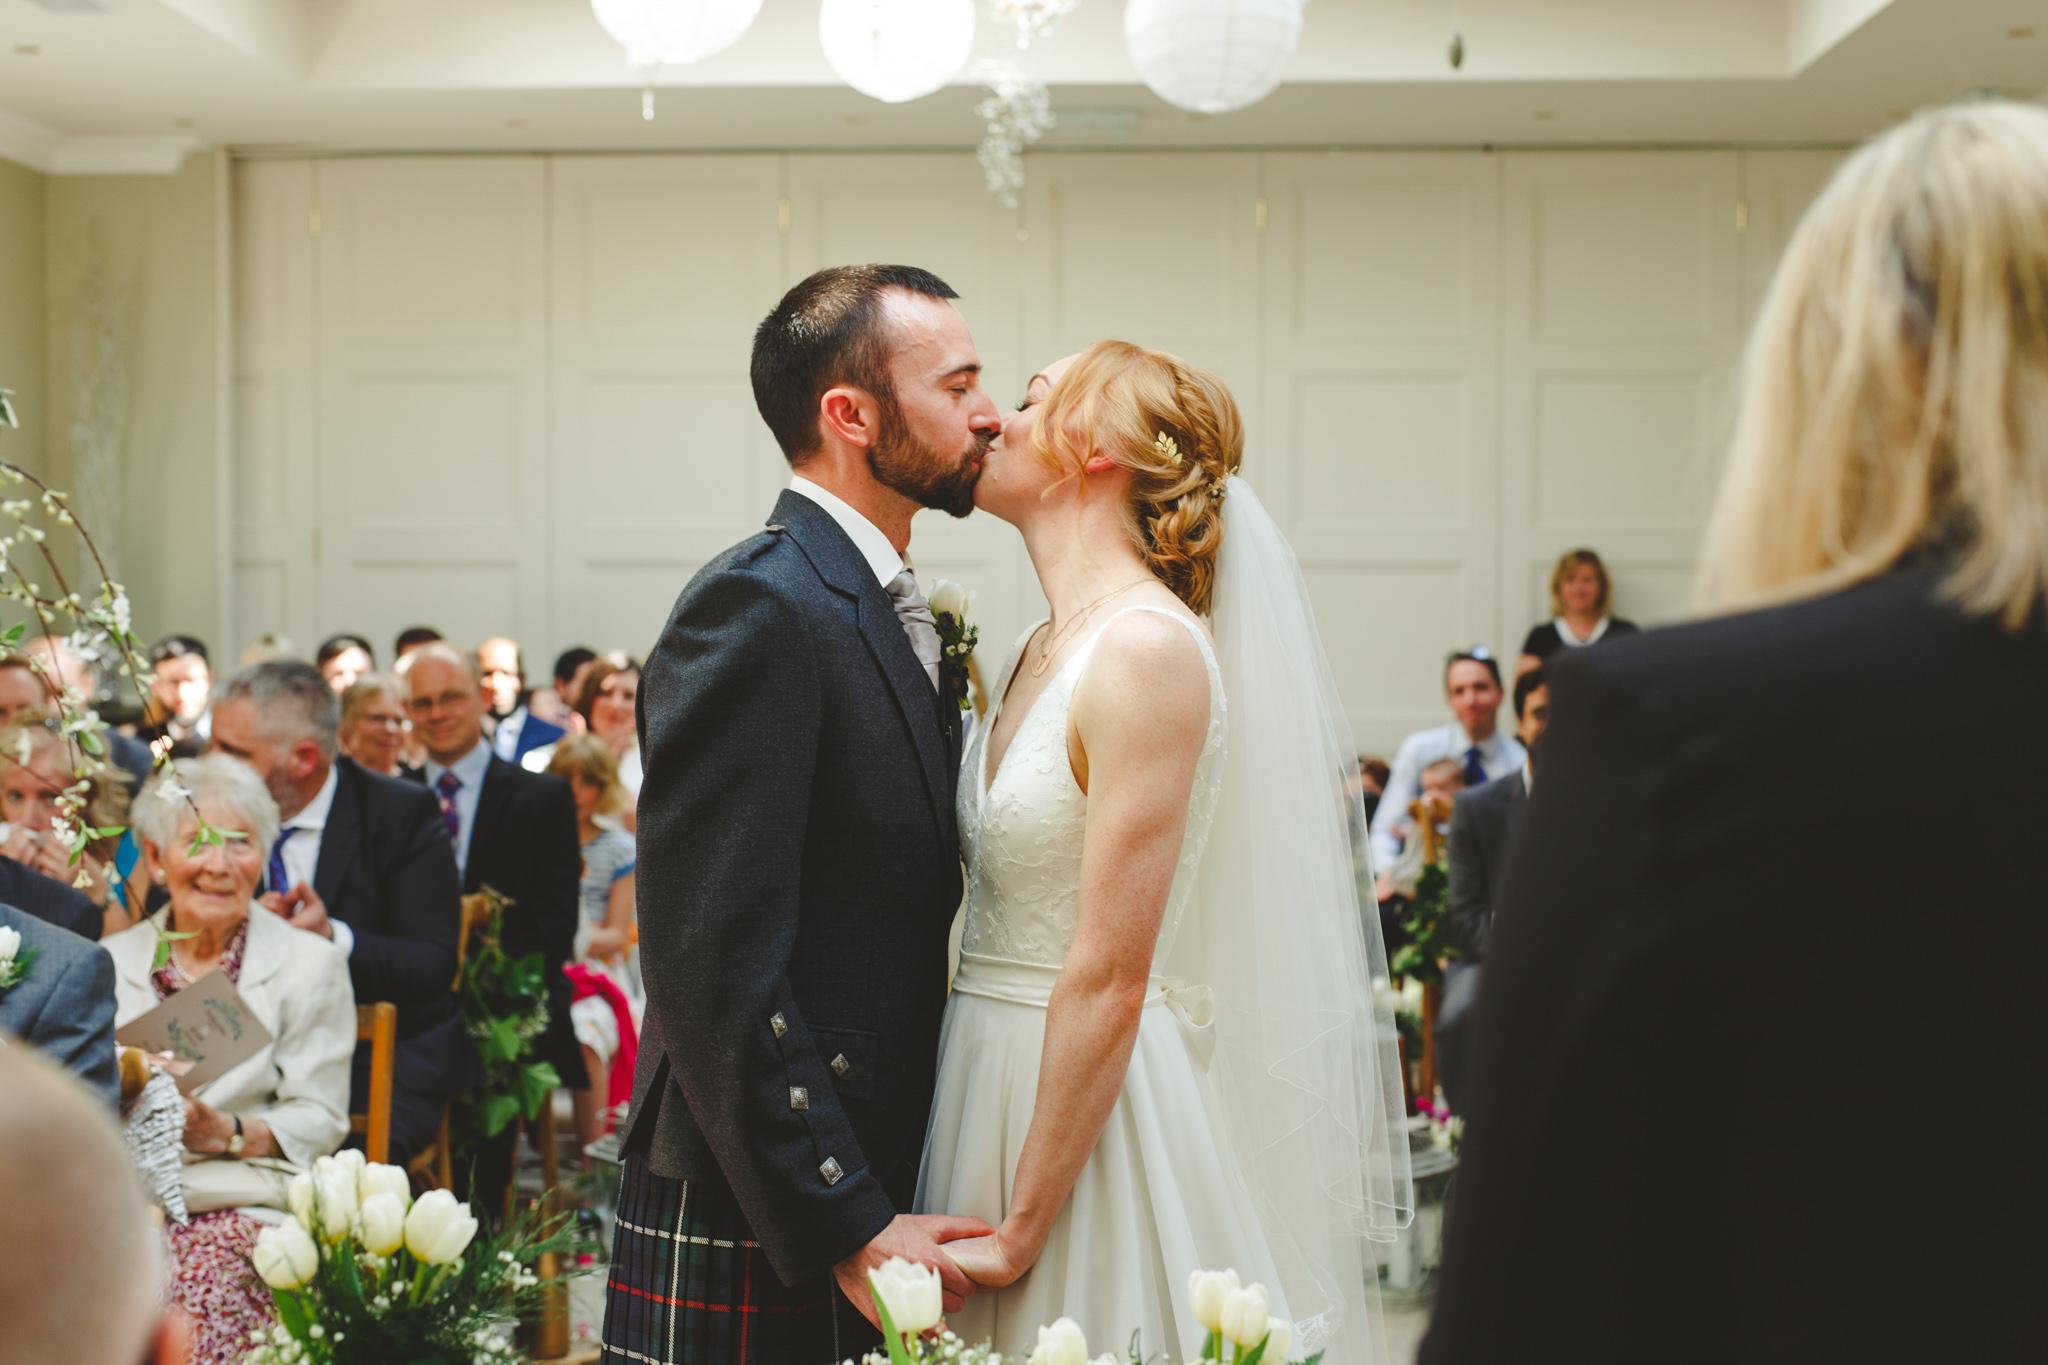 derbyshire-wedding-photographer-videographer-camera-hannah-11.jpg